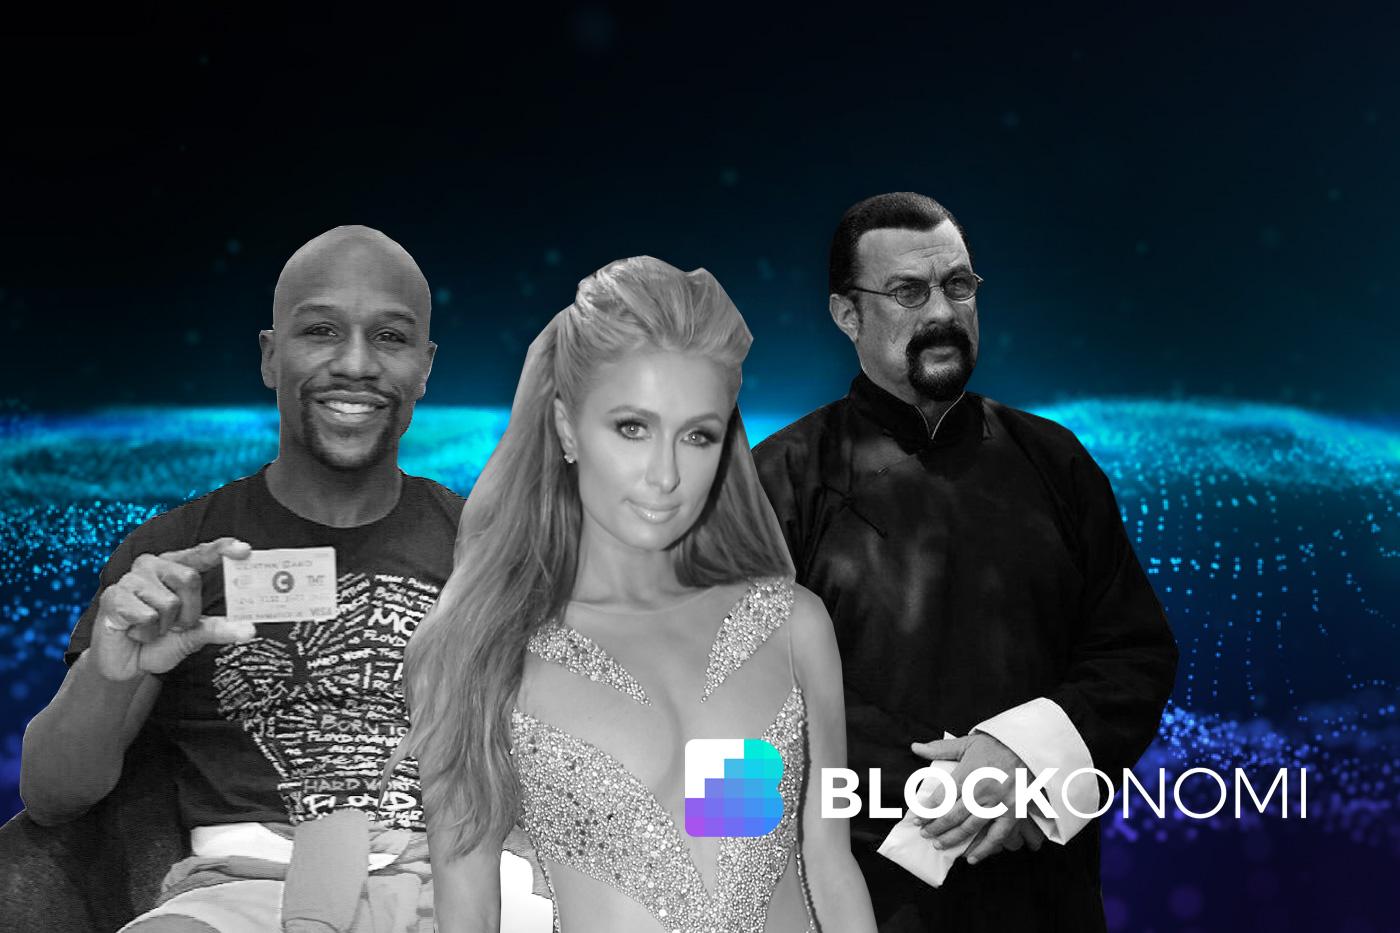 Celebrities Cryptocurrency